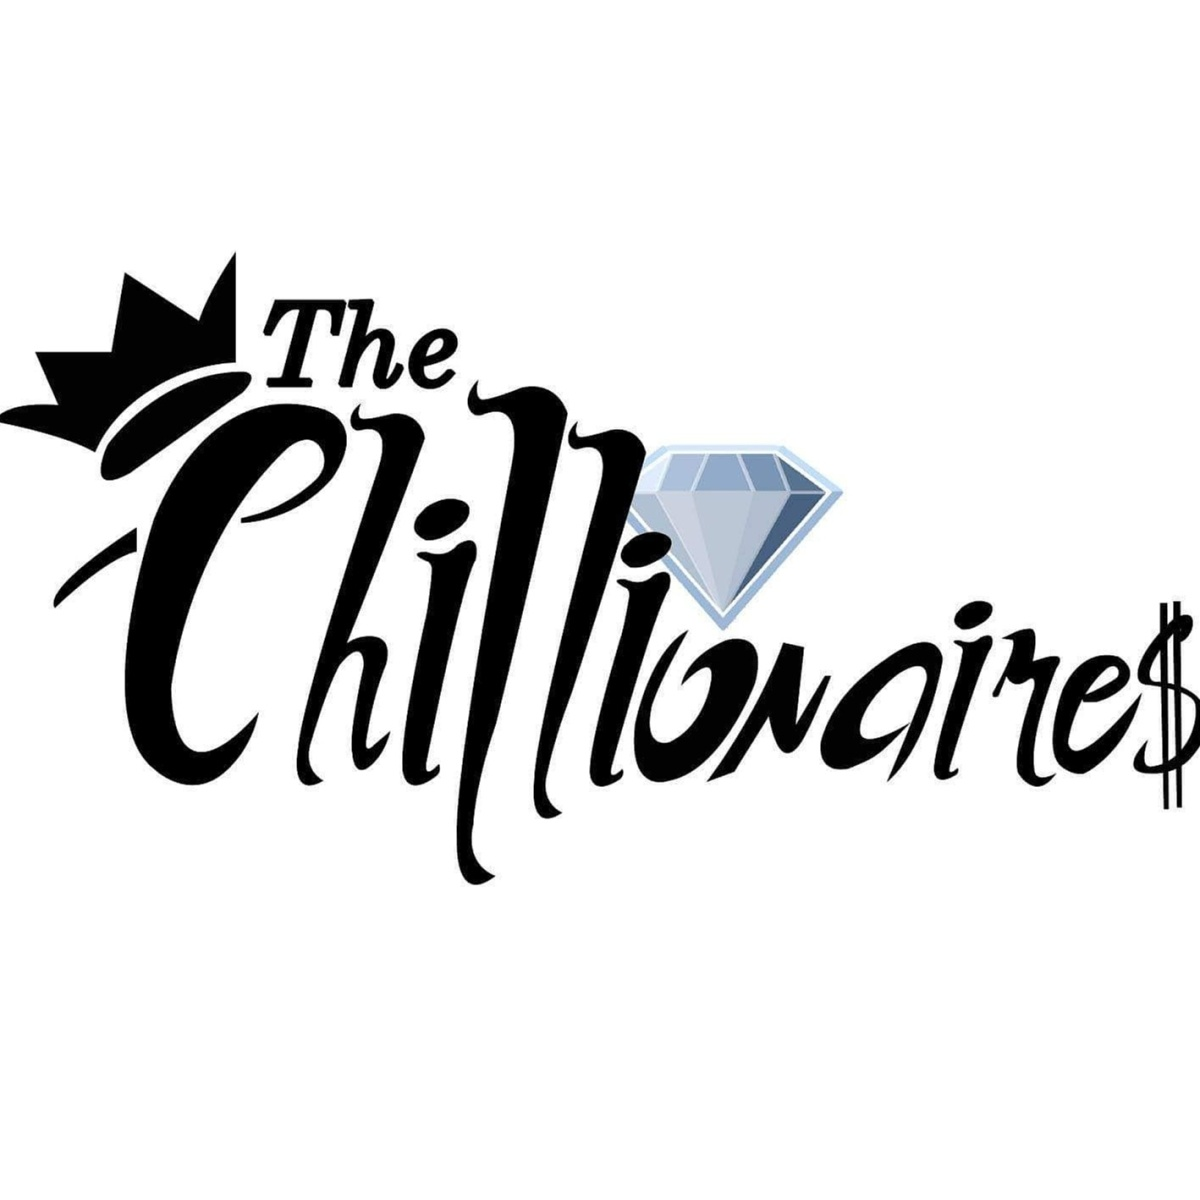 The Chillionaires